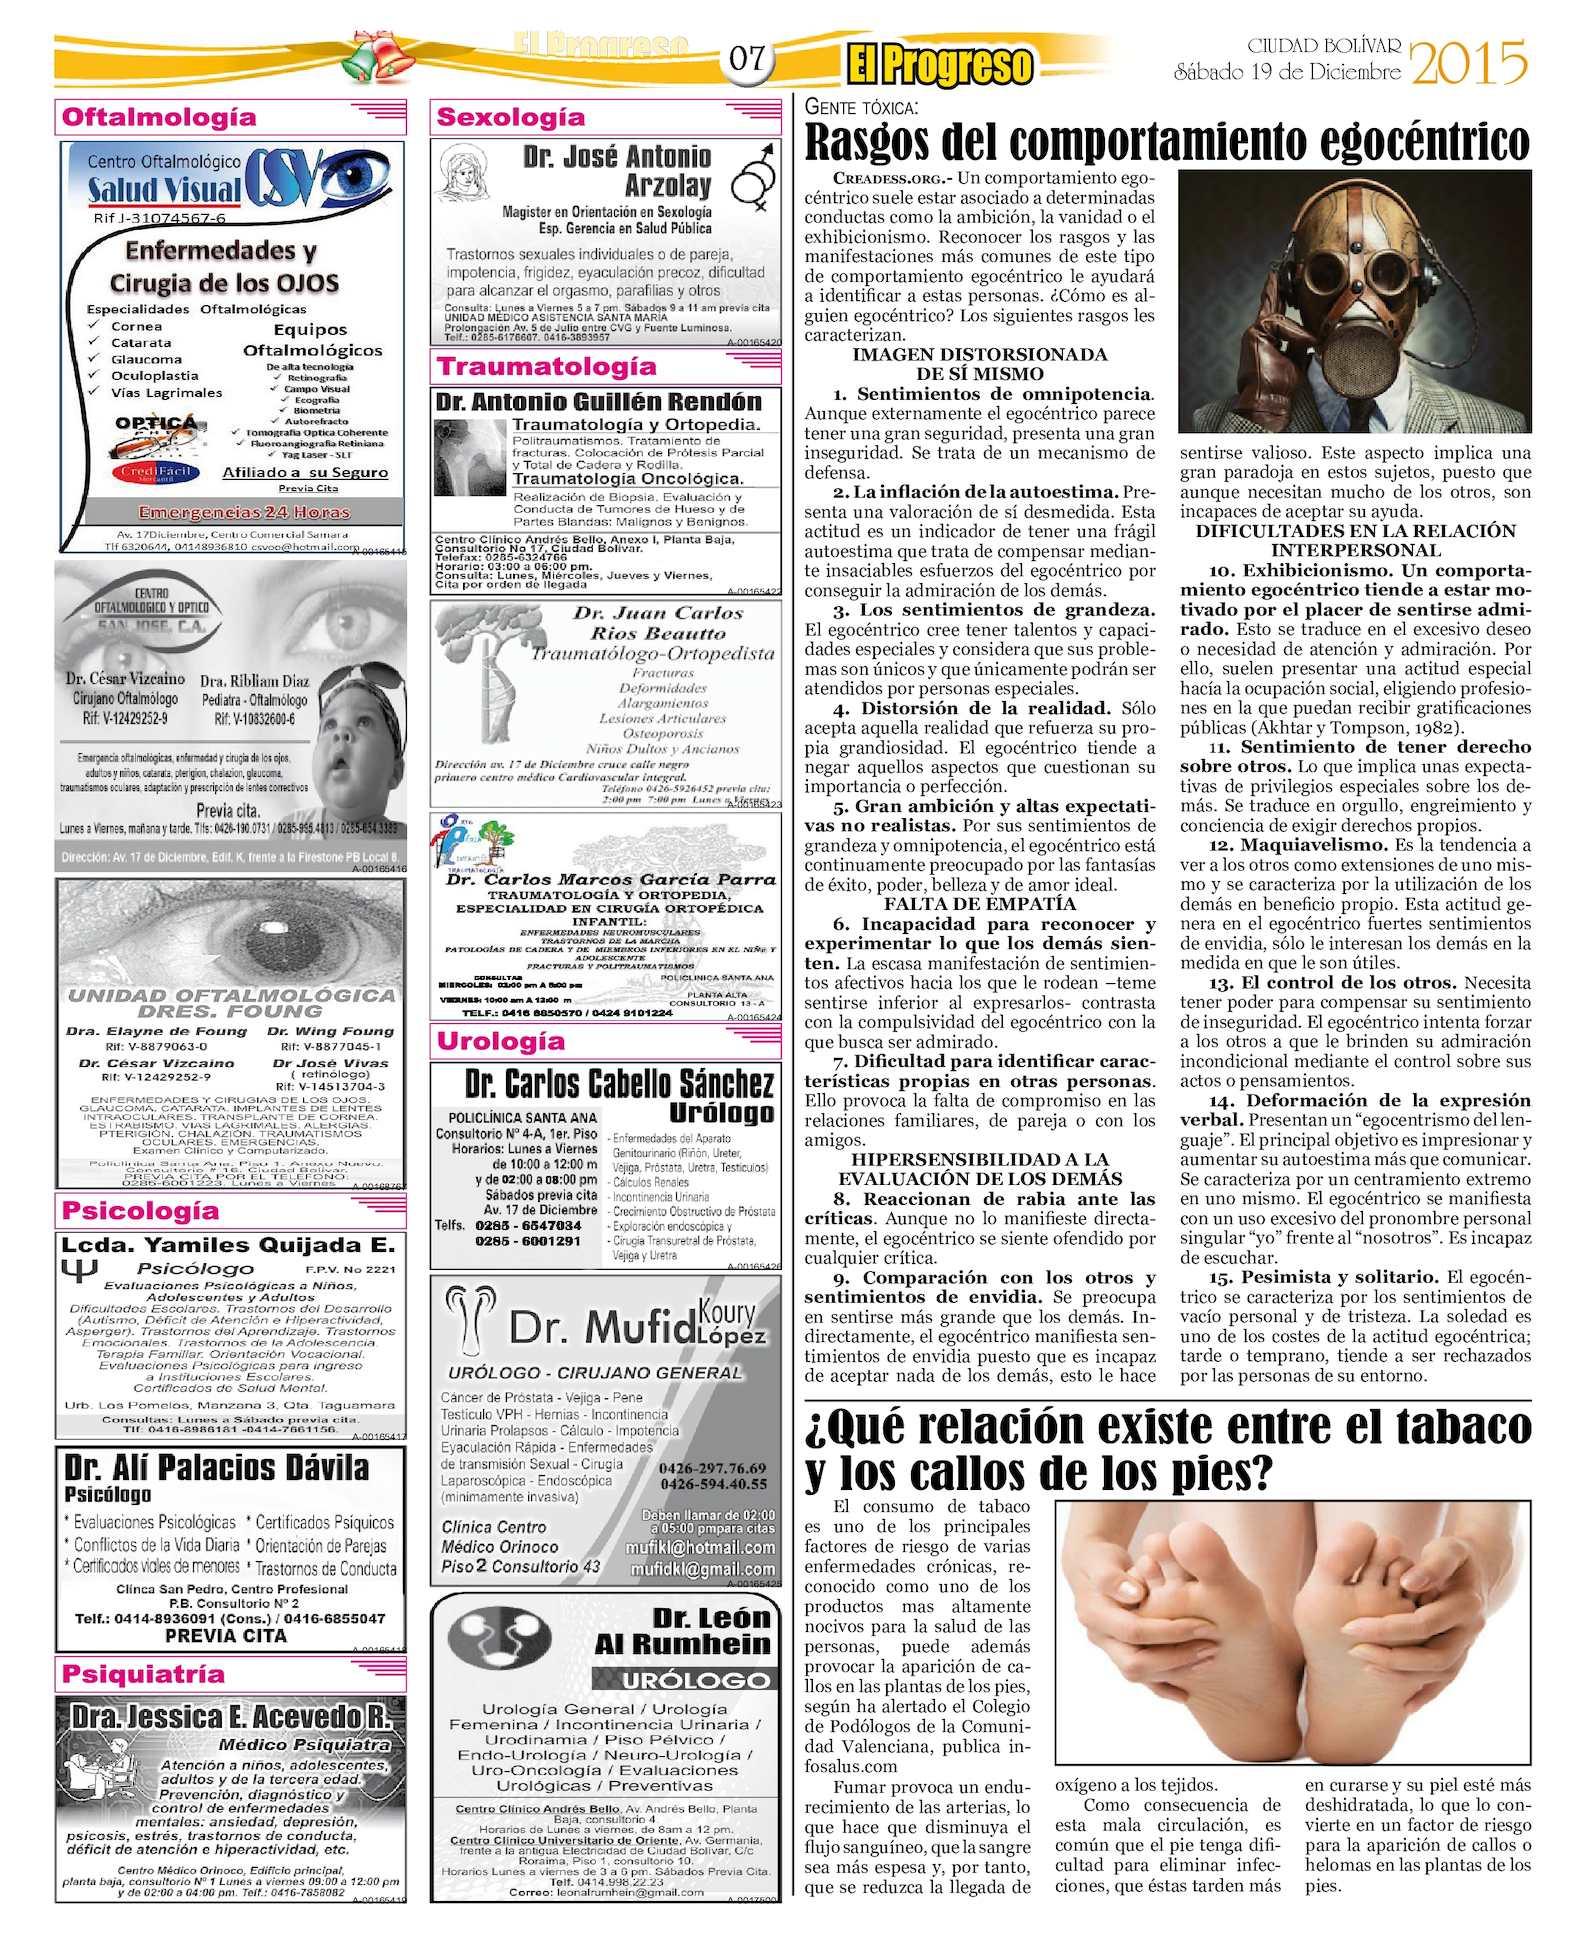 Medico pedro diagnostico san